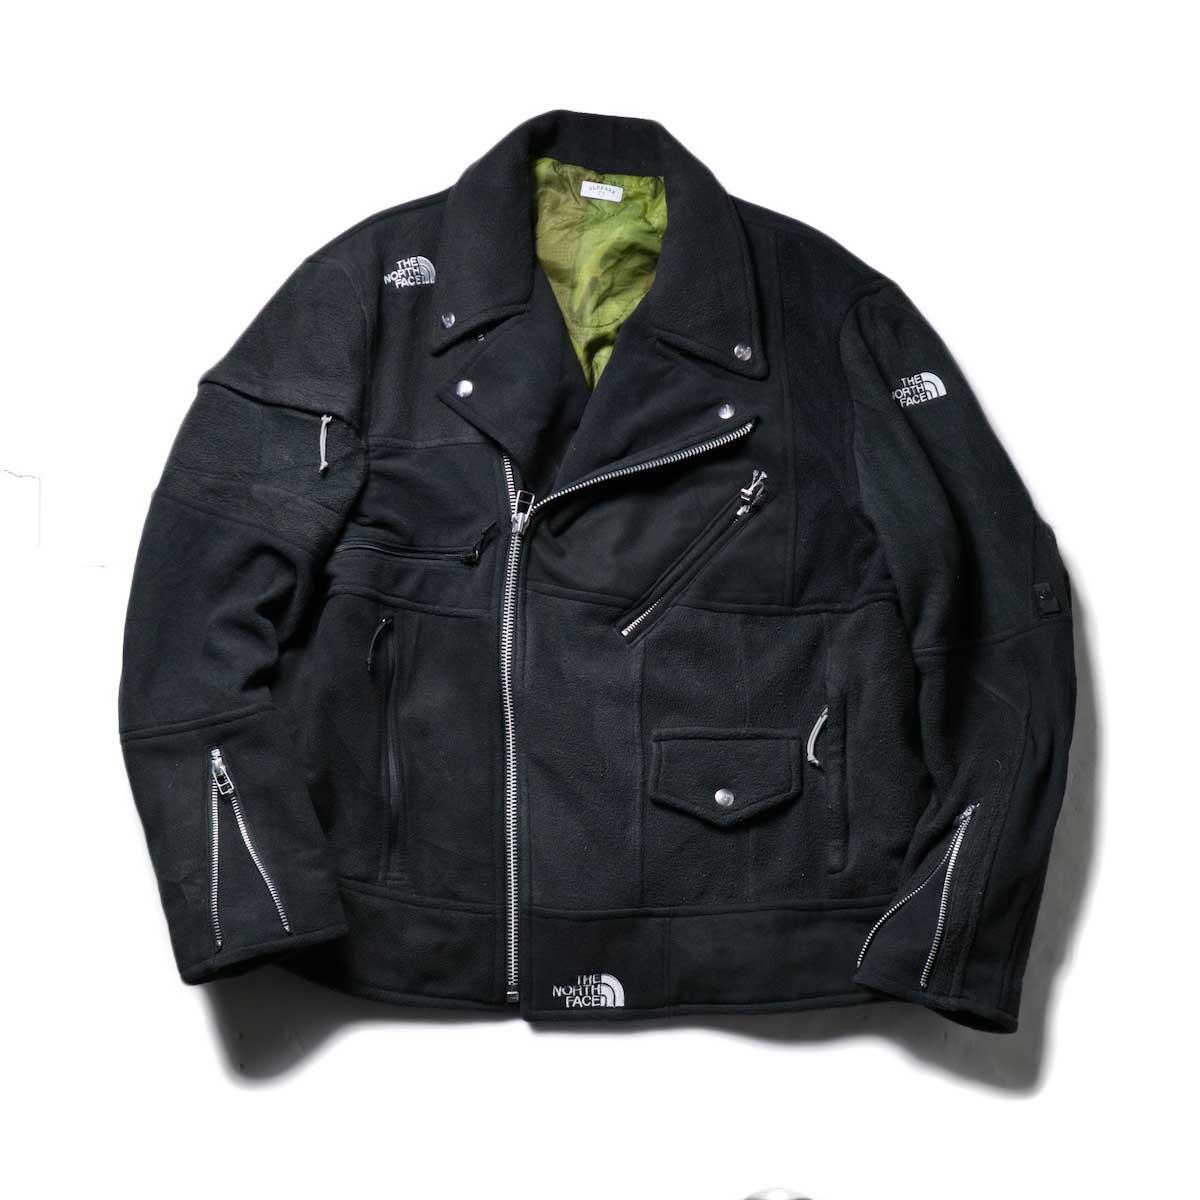 OLD PARK / Oversized Riders Jacket -Outdoor (Black)